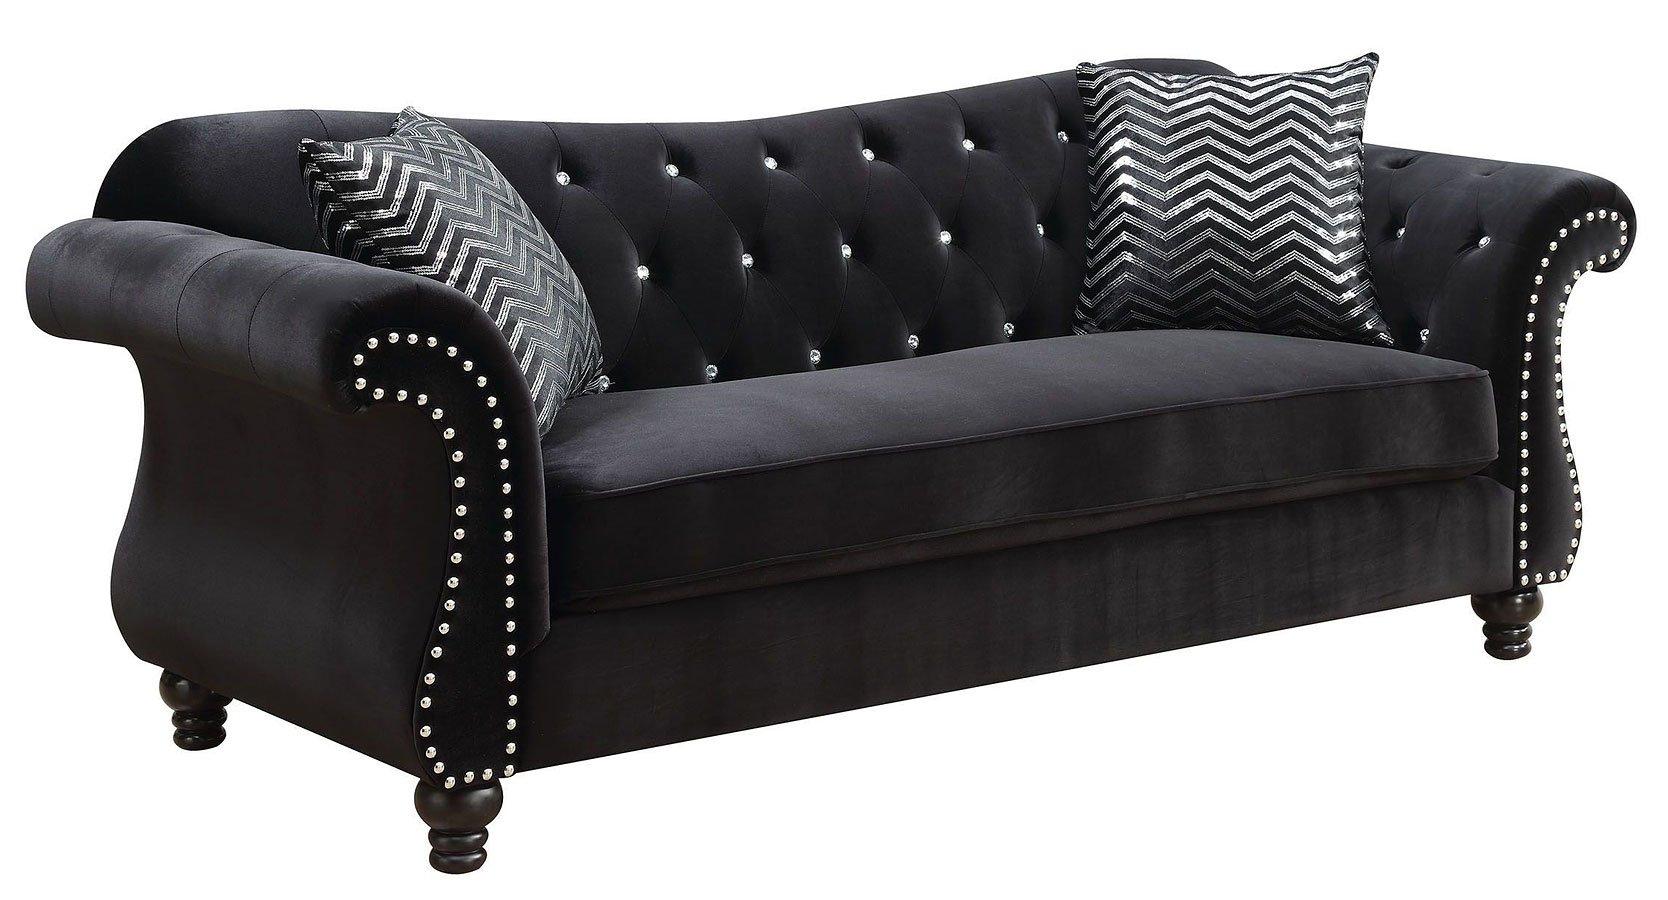 Jolanda Living Room Set Black By Furniture Of America 1 Reviews